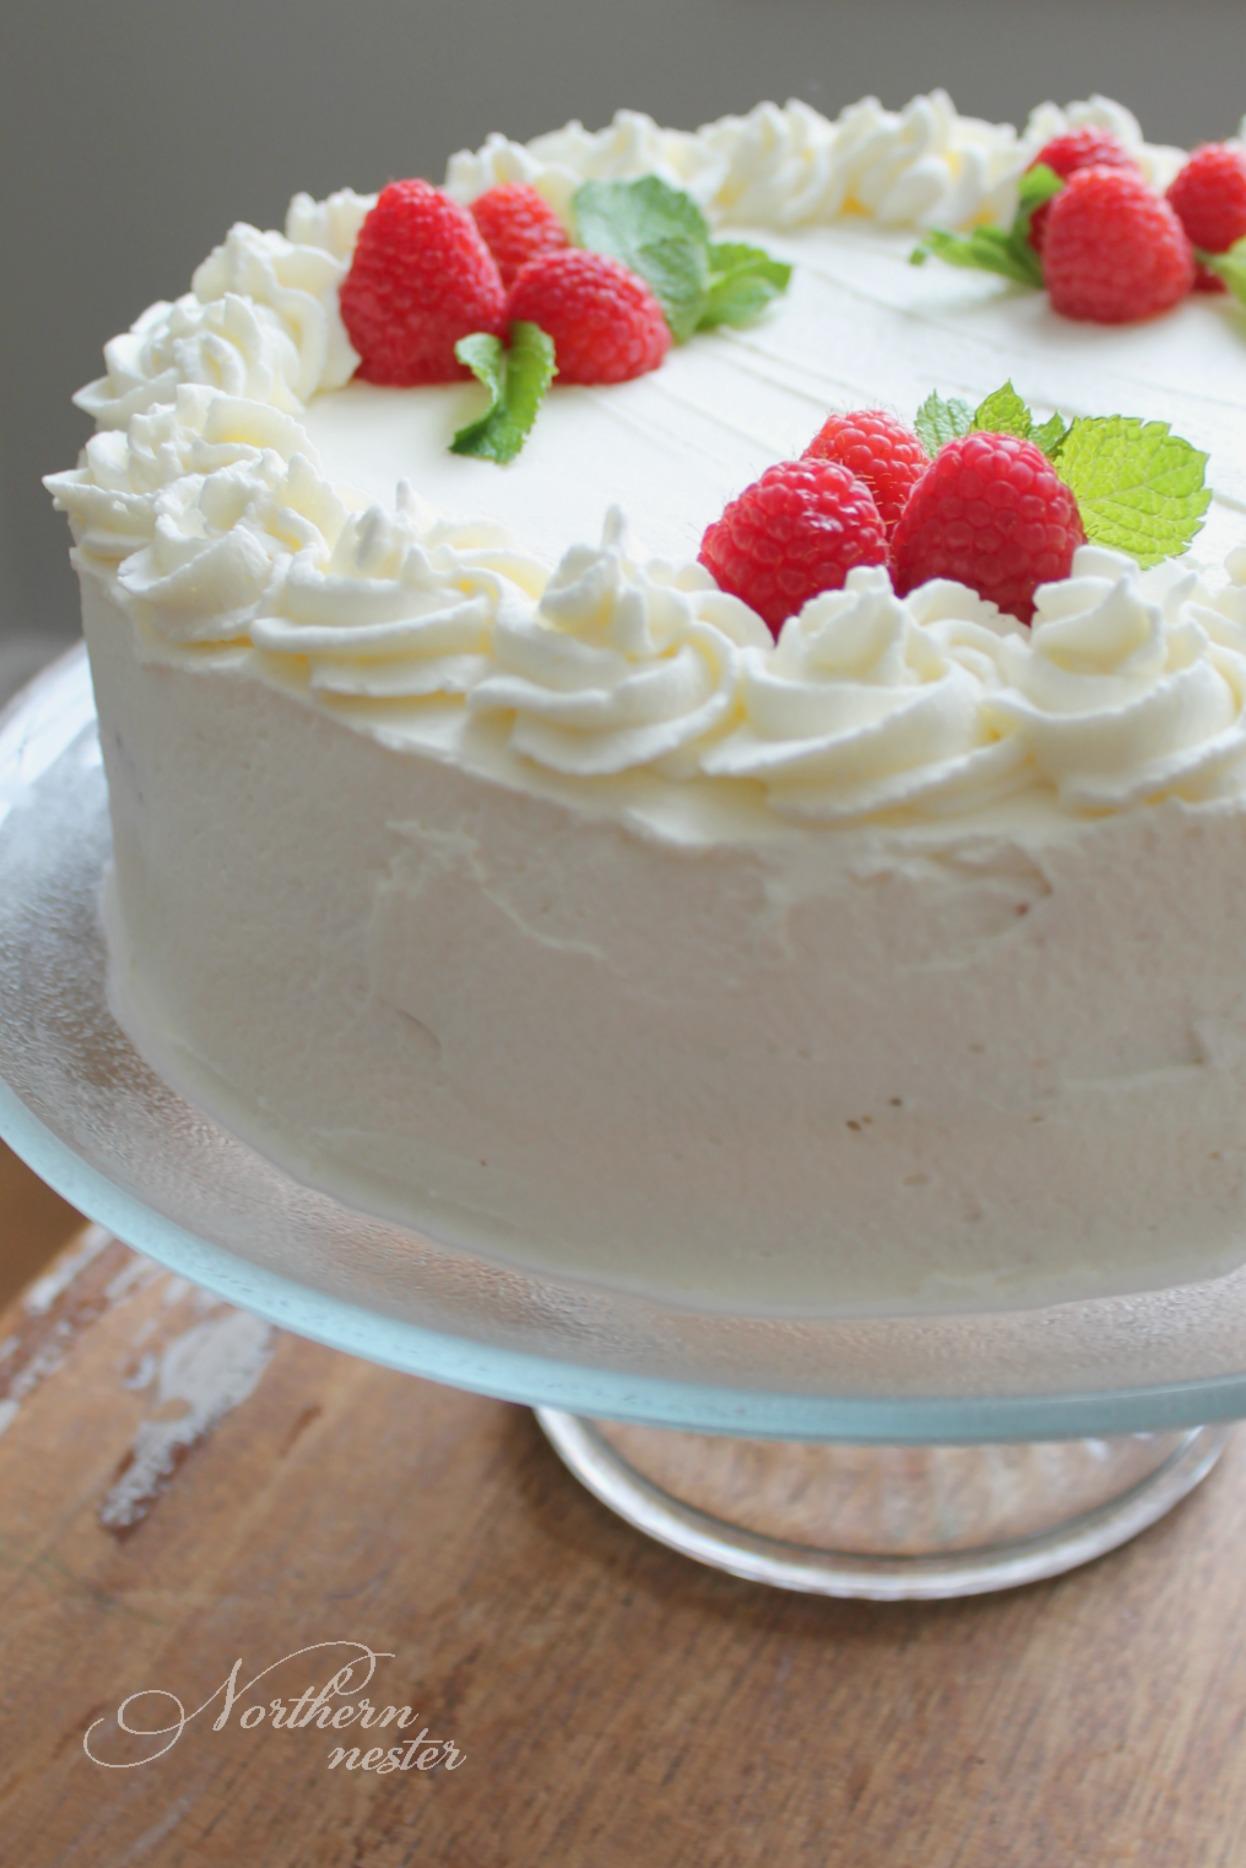 Lemon Raspberry Mousse Cake | THM: S - Northern Nester